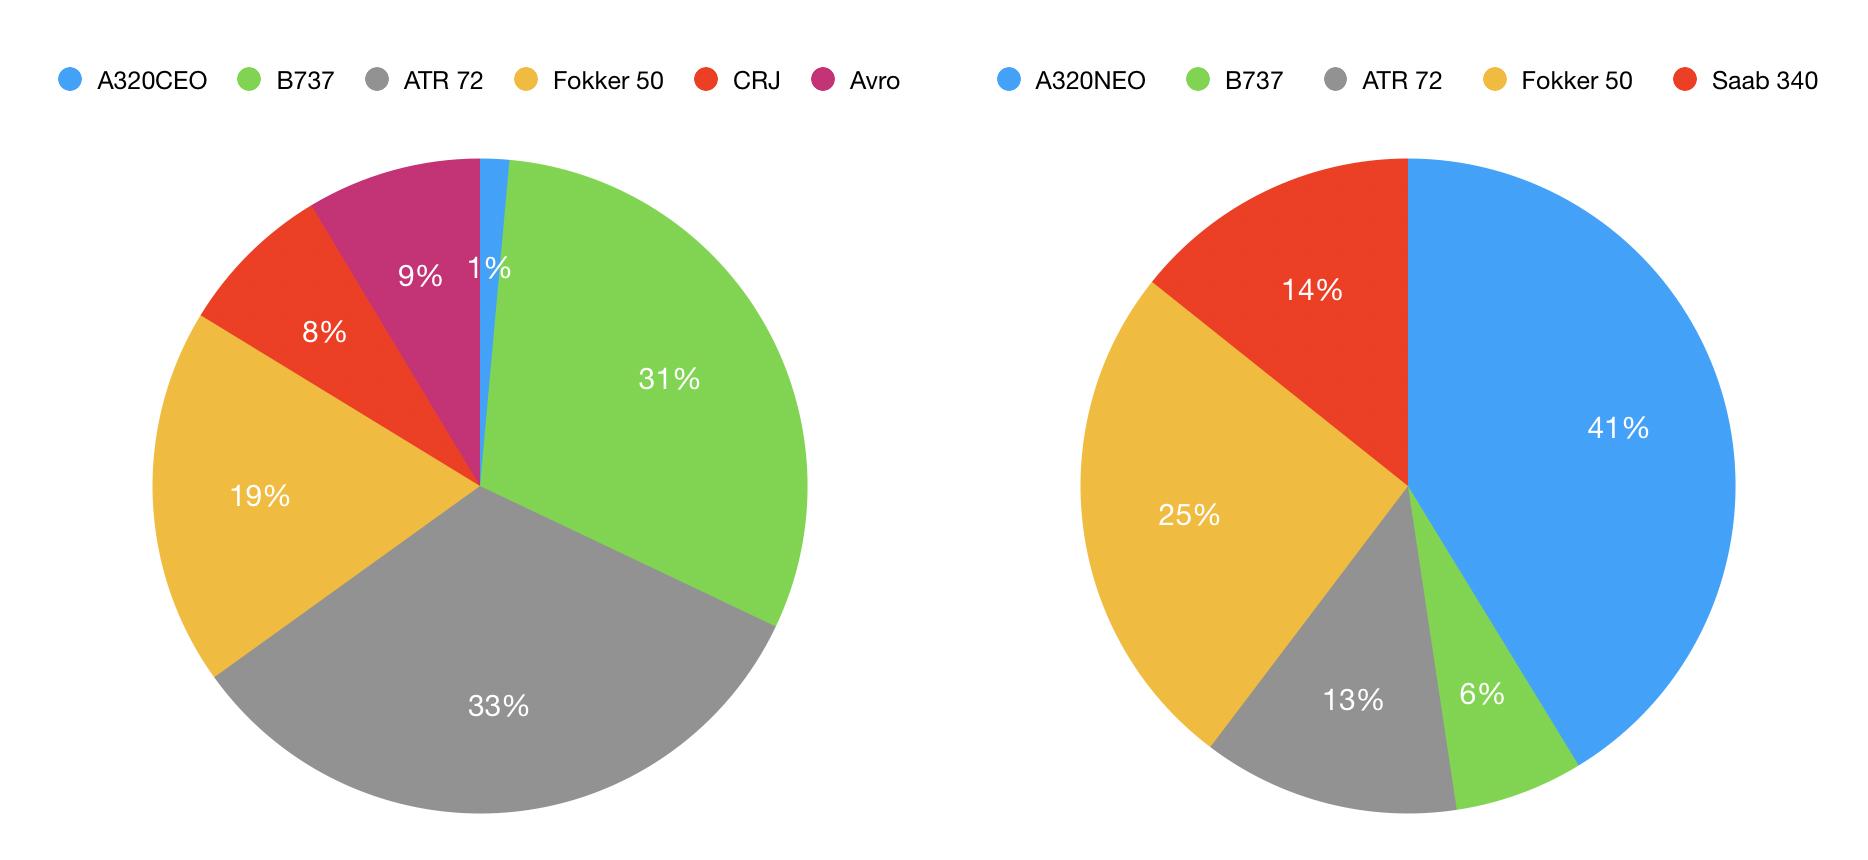 Swedish domestic fleet mix 2019 versus 2020